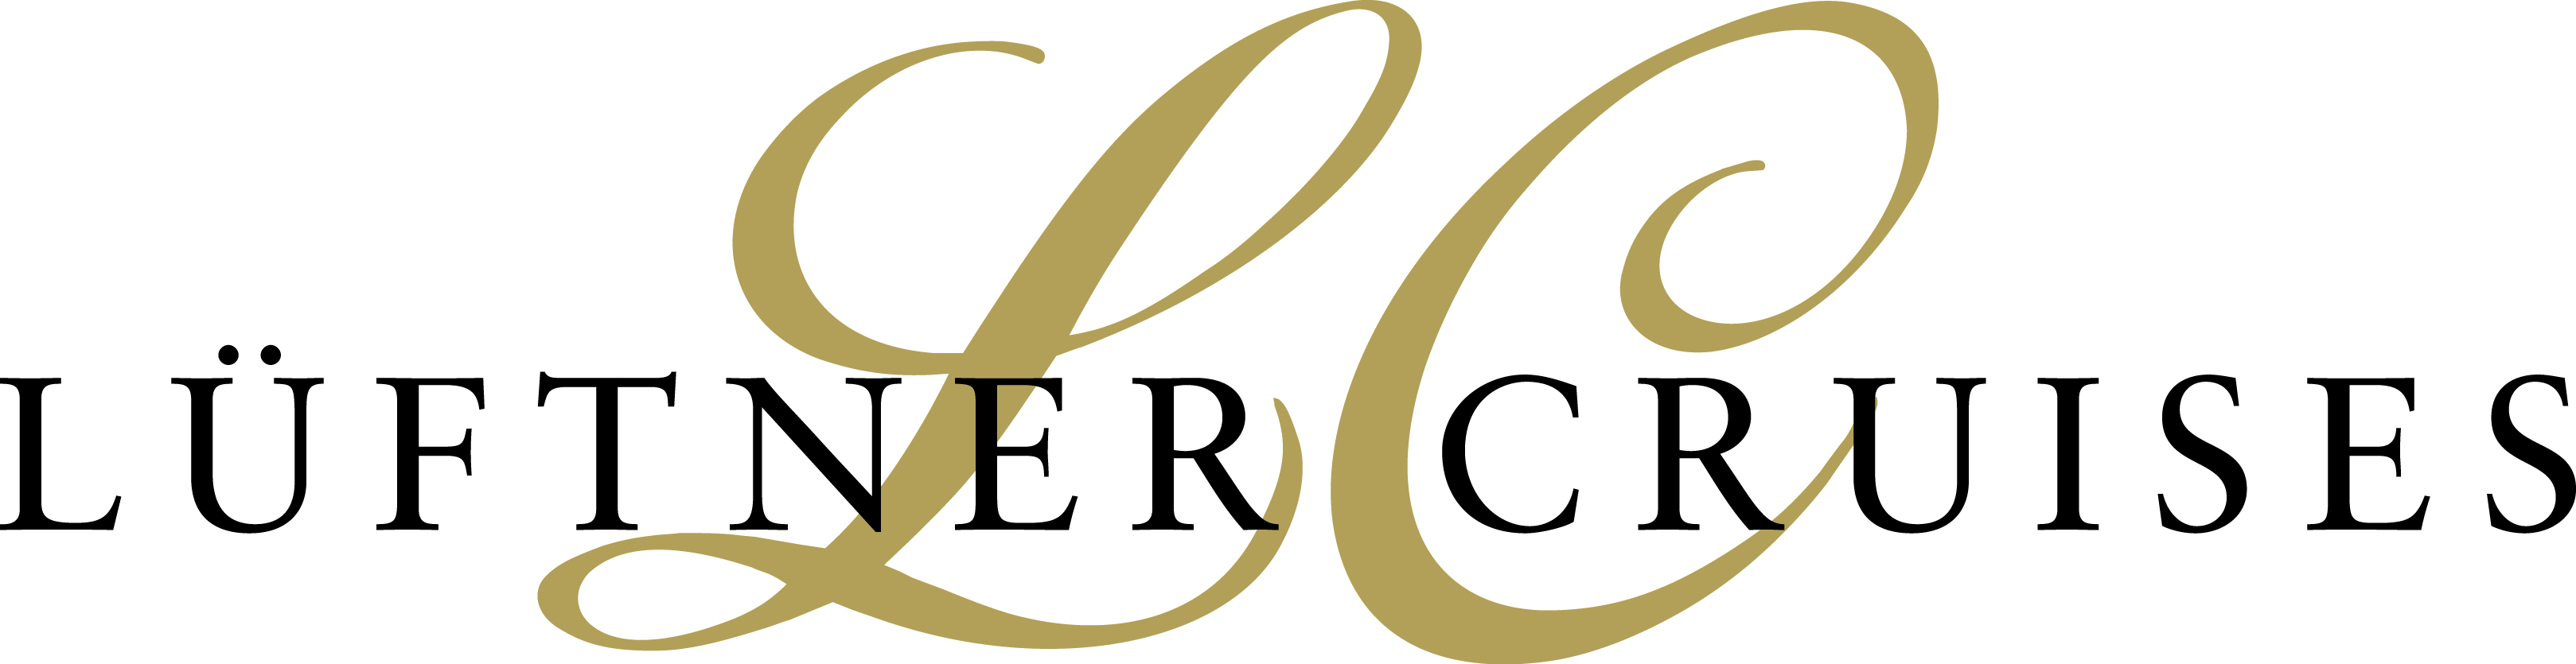 Lueftner_Cruises_Logo_300dpi_CMYK